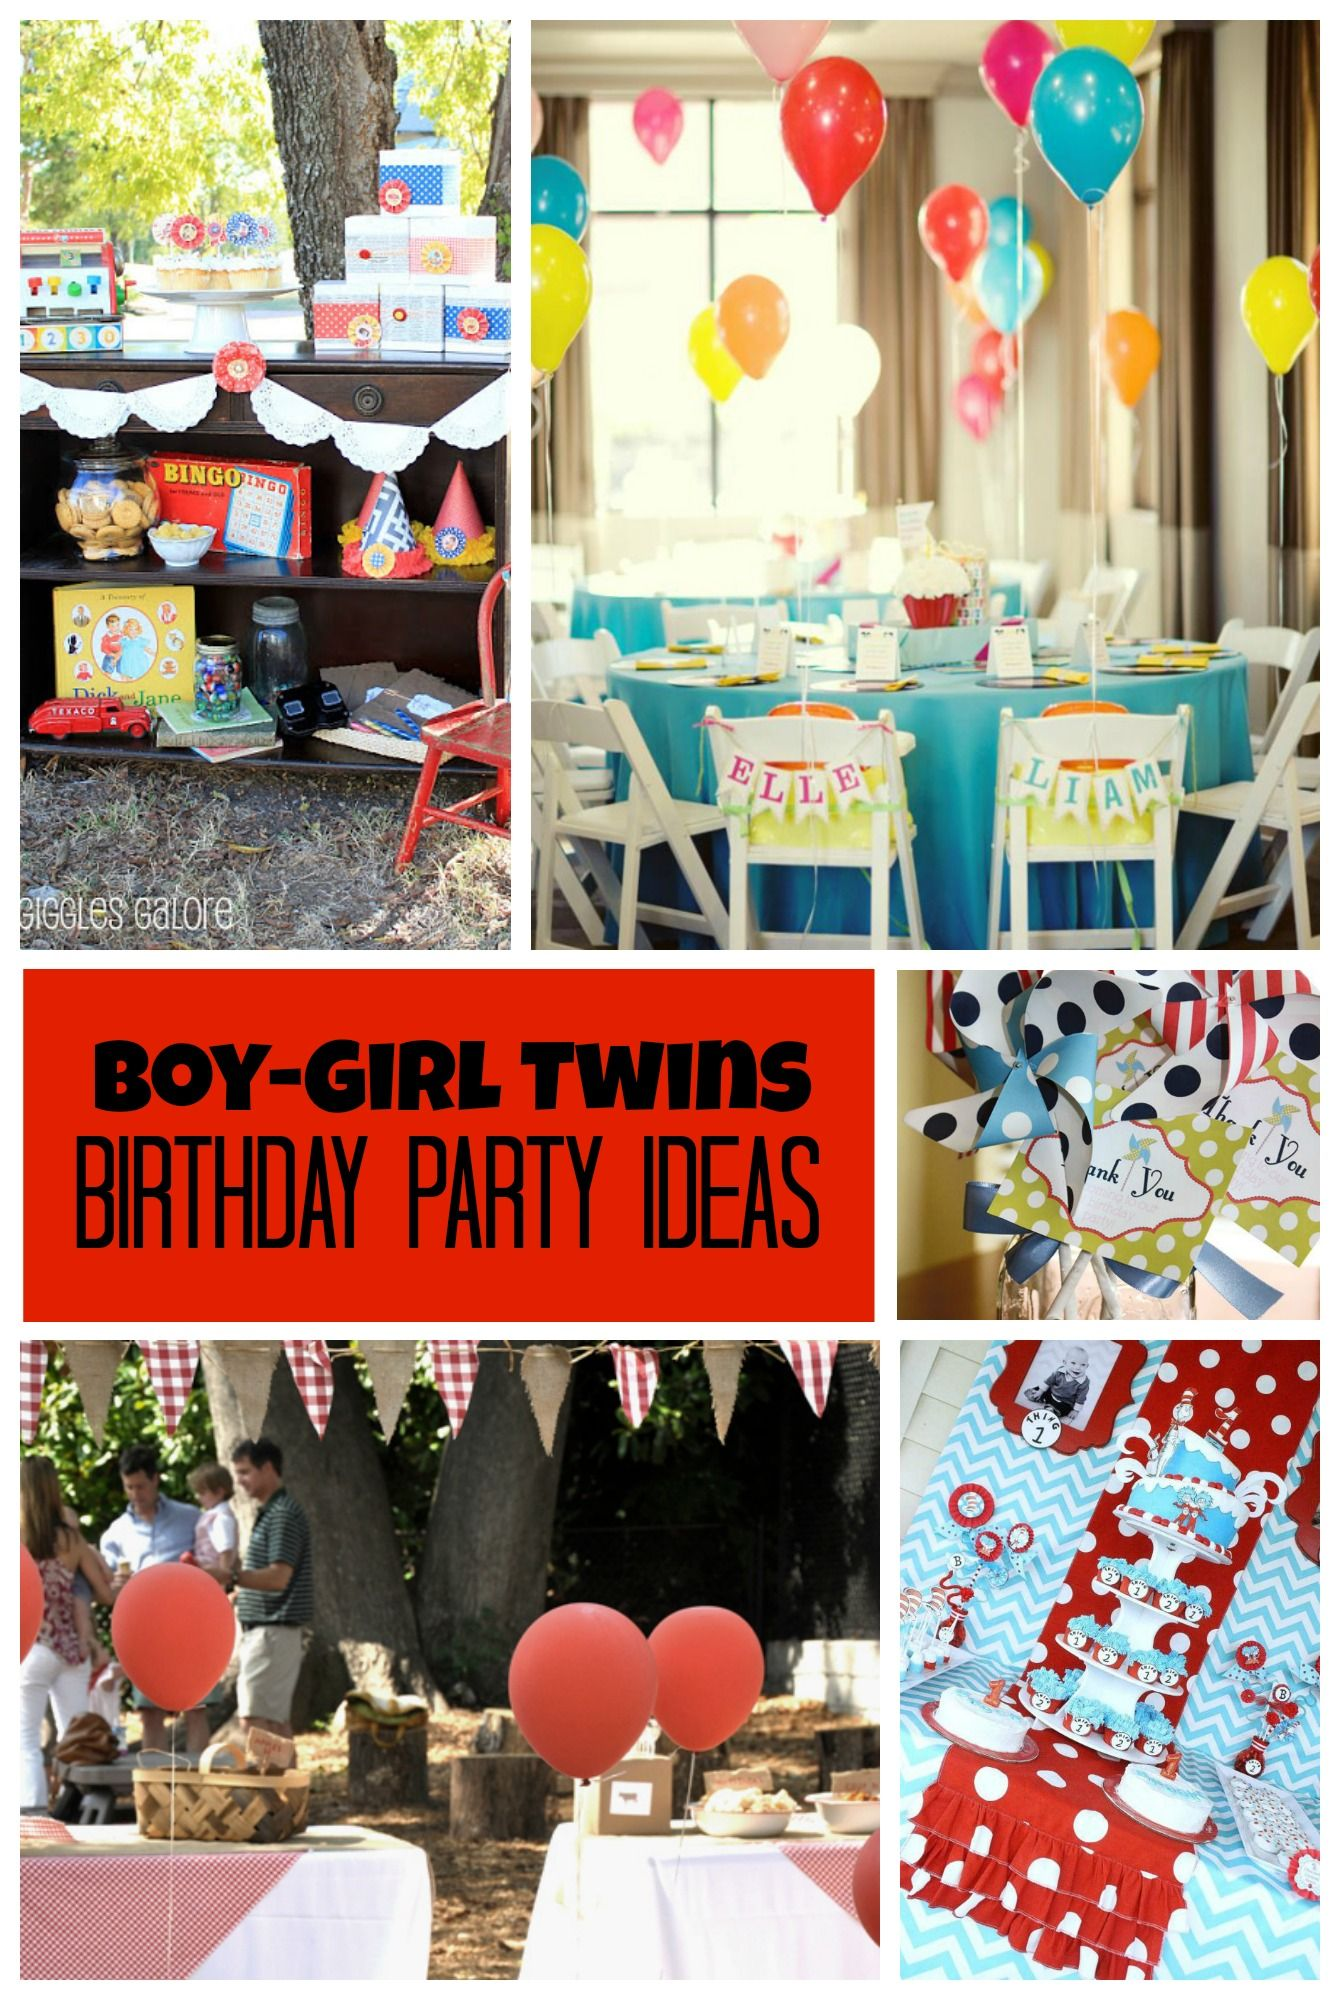 Twins Birthday Party Ideas For Boy Girl Twins